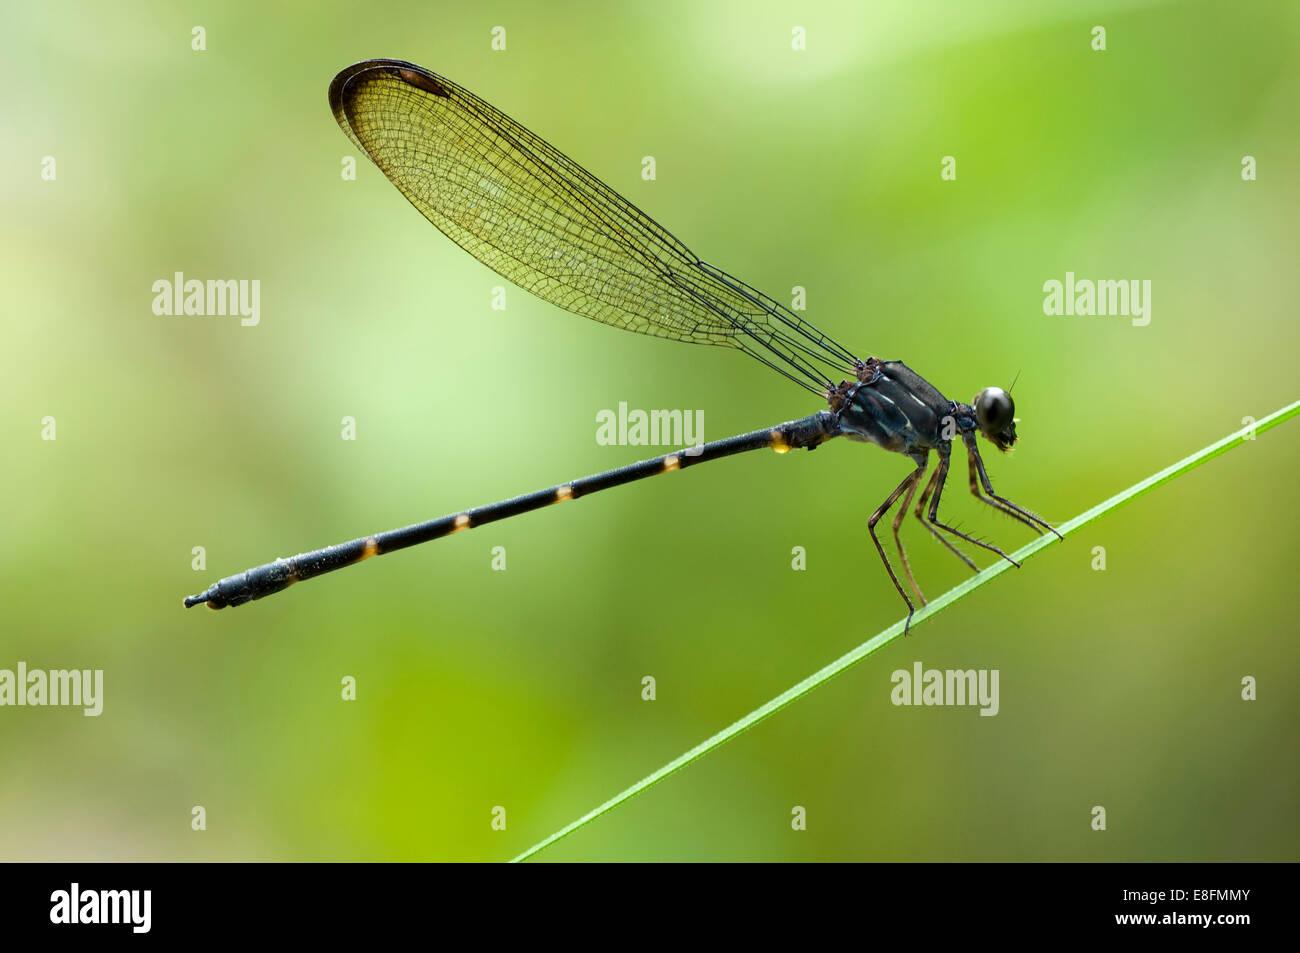 Indonesia, West Kalimantan, Bengkayang, Bamboo Tail dragonfly - Stock Image